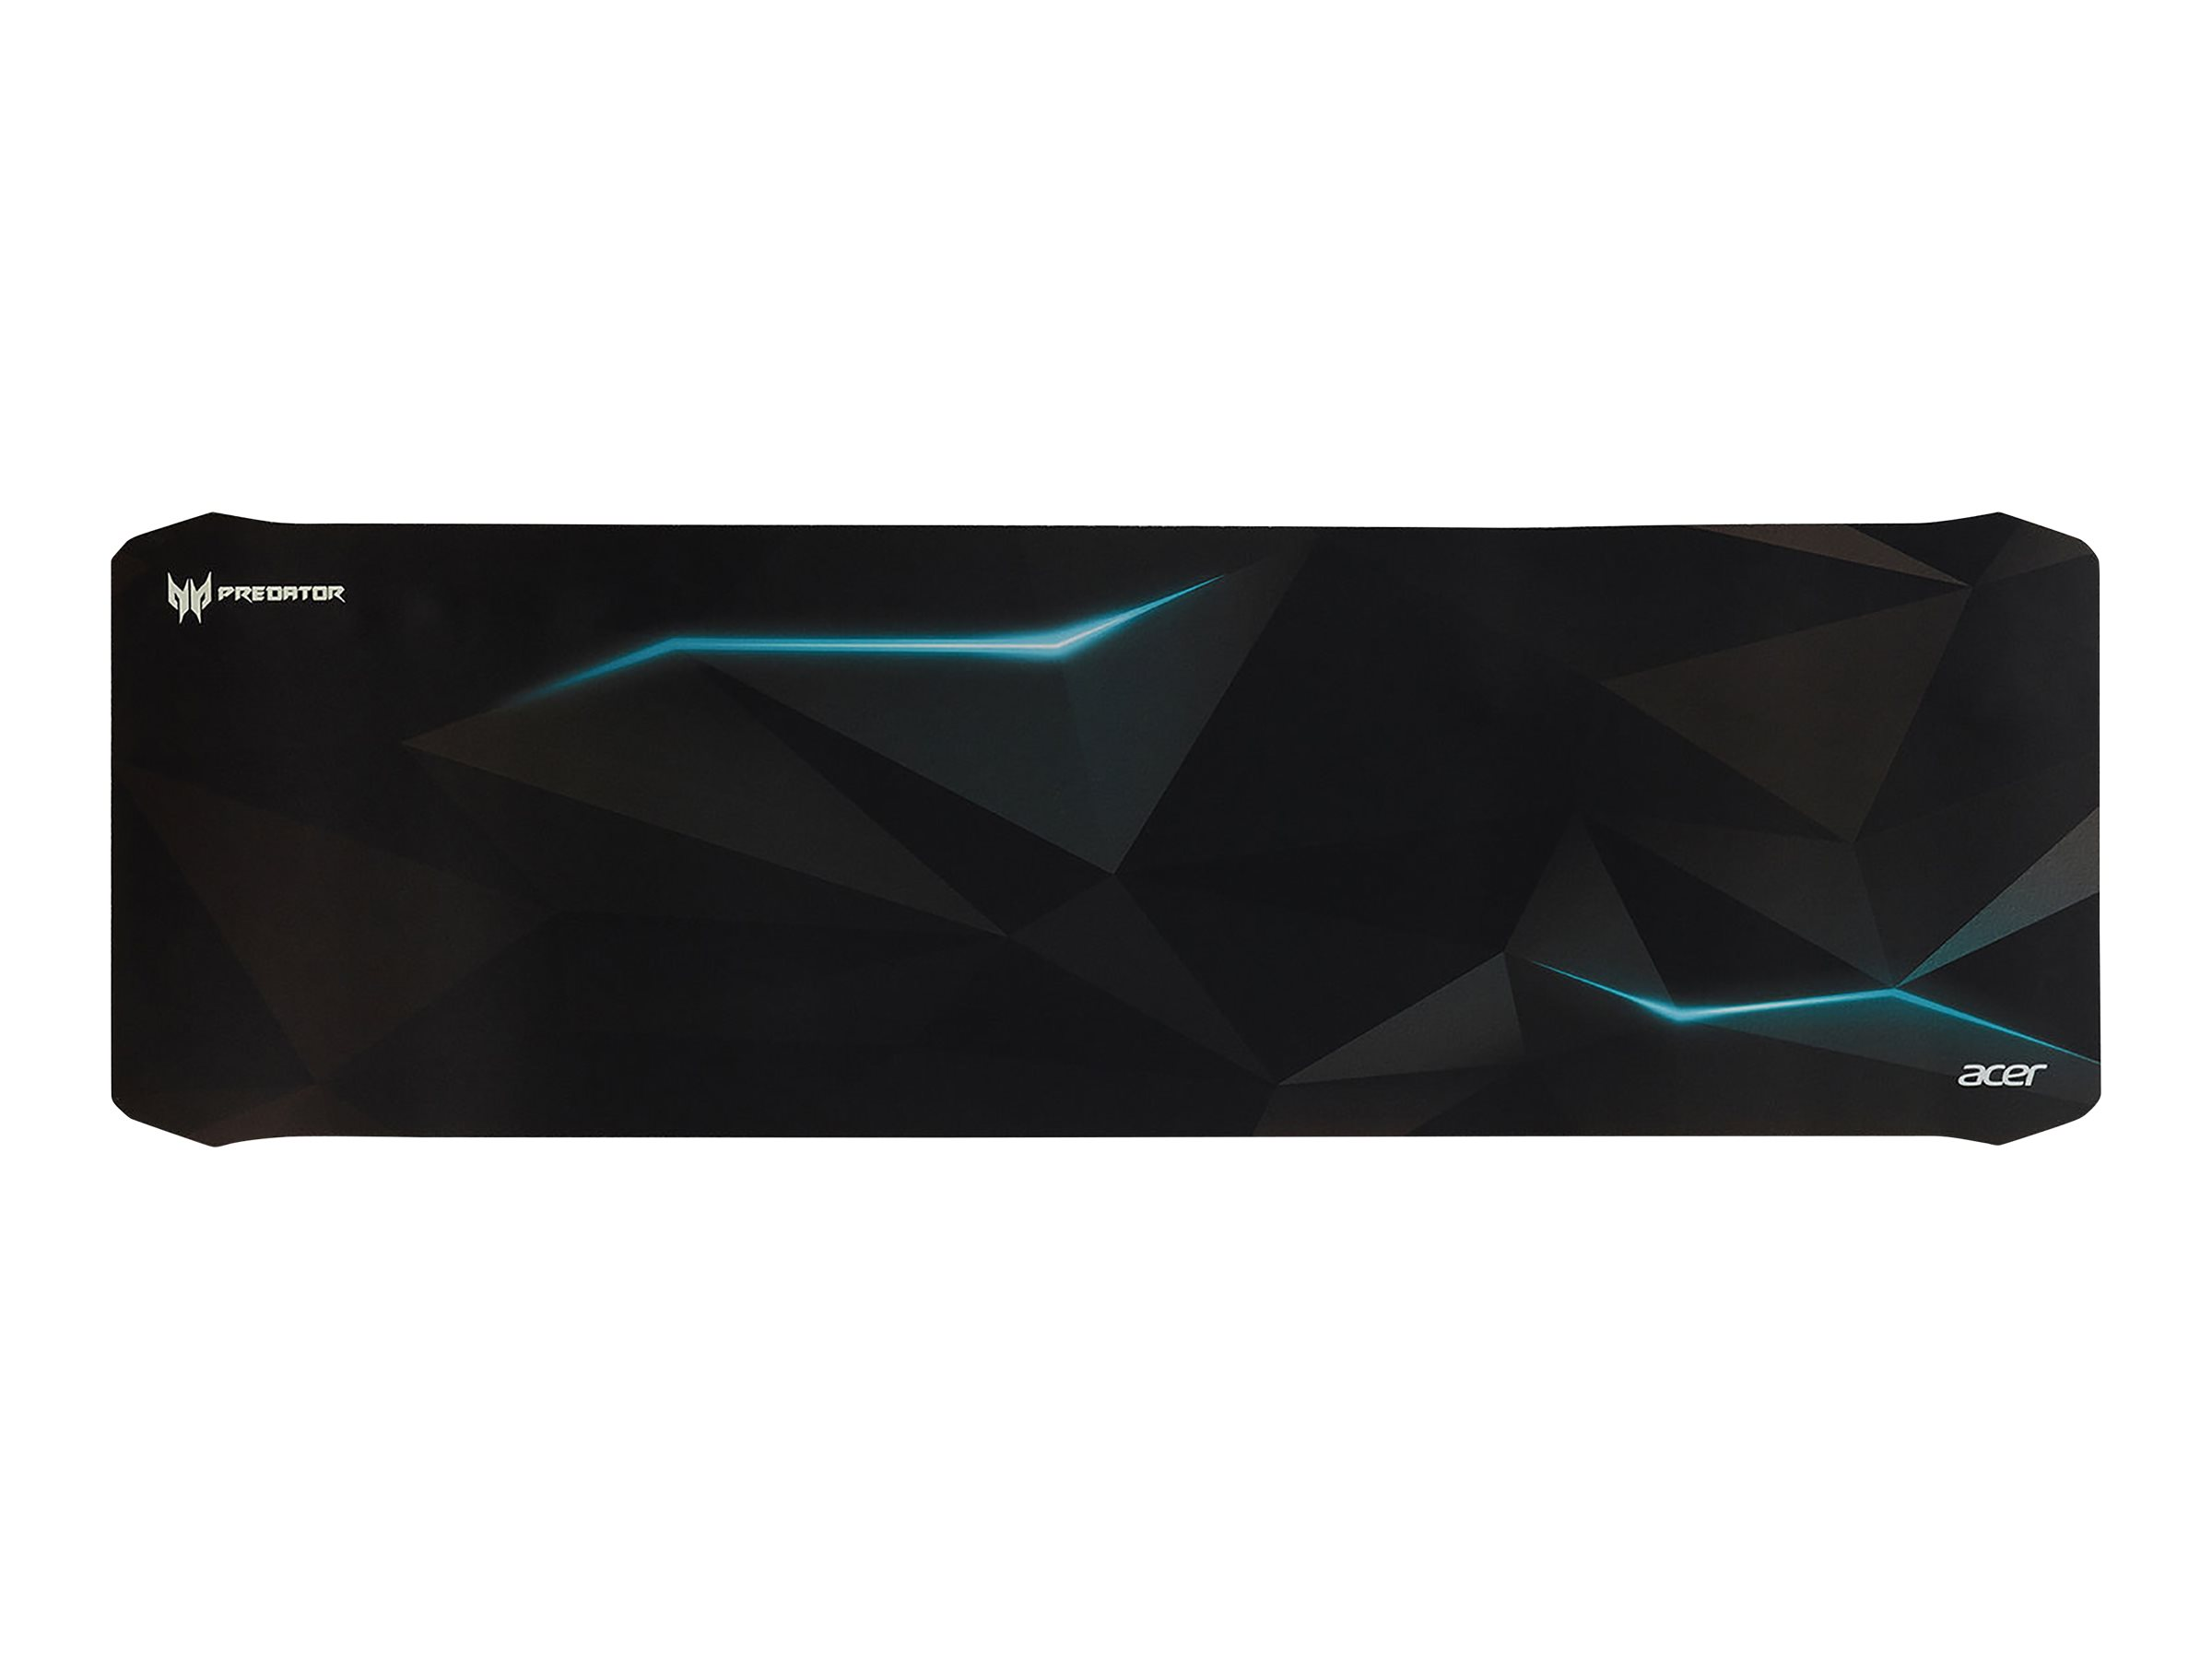 Acer Predator Gaming PMP720 - mouse pad